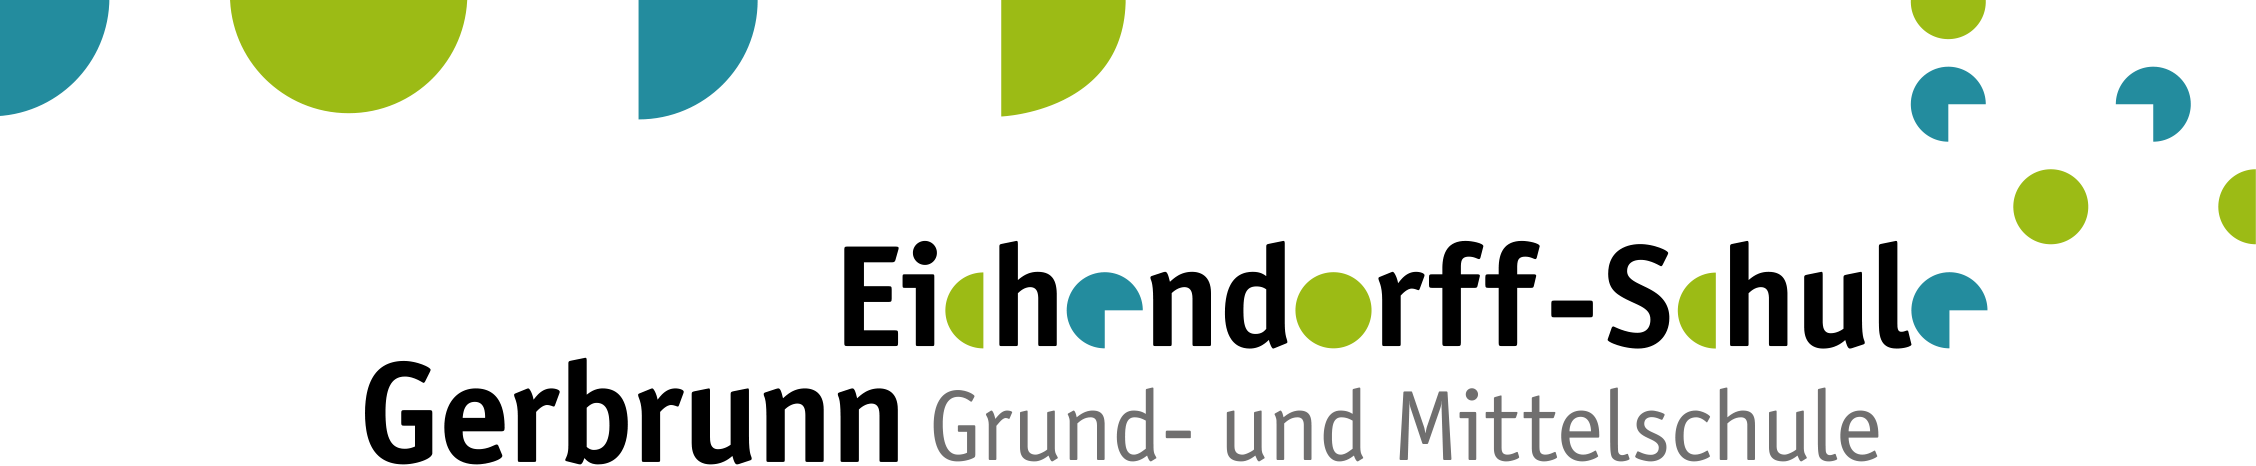 Eichendorff-Schule Gerbrunn